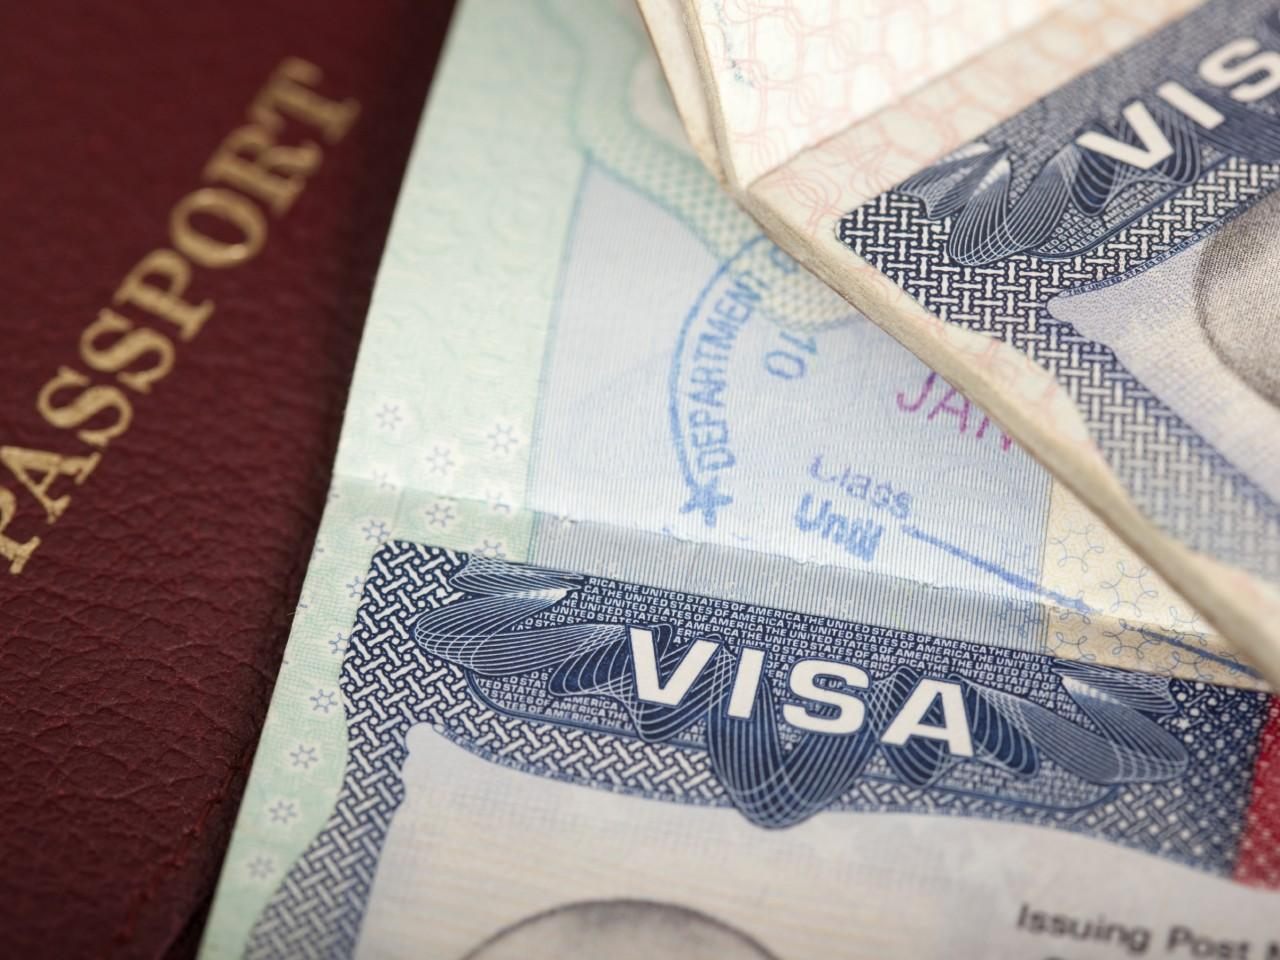 Croatia introduces new visa rules for citizens of Azerbaijan